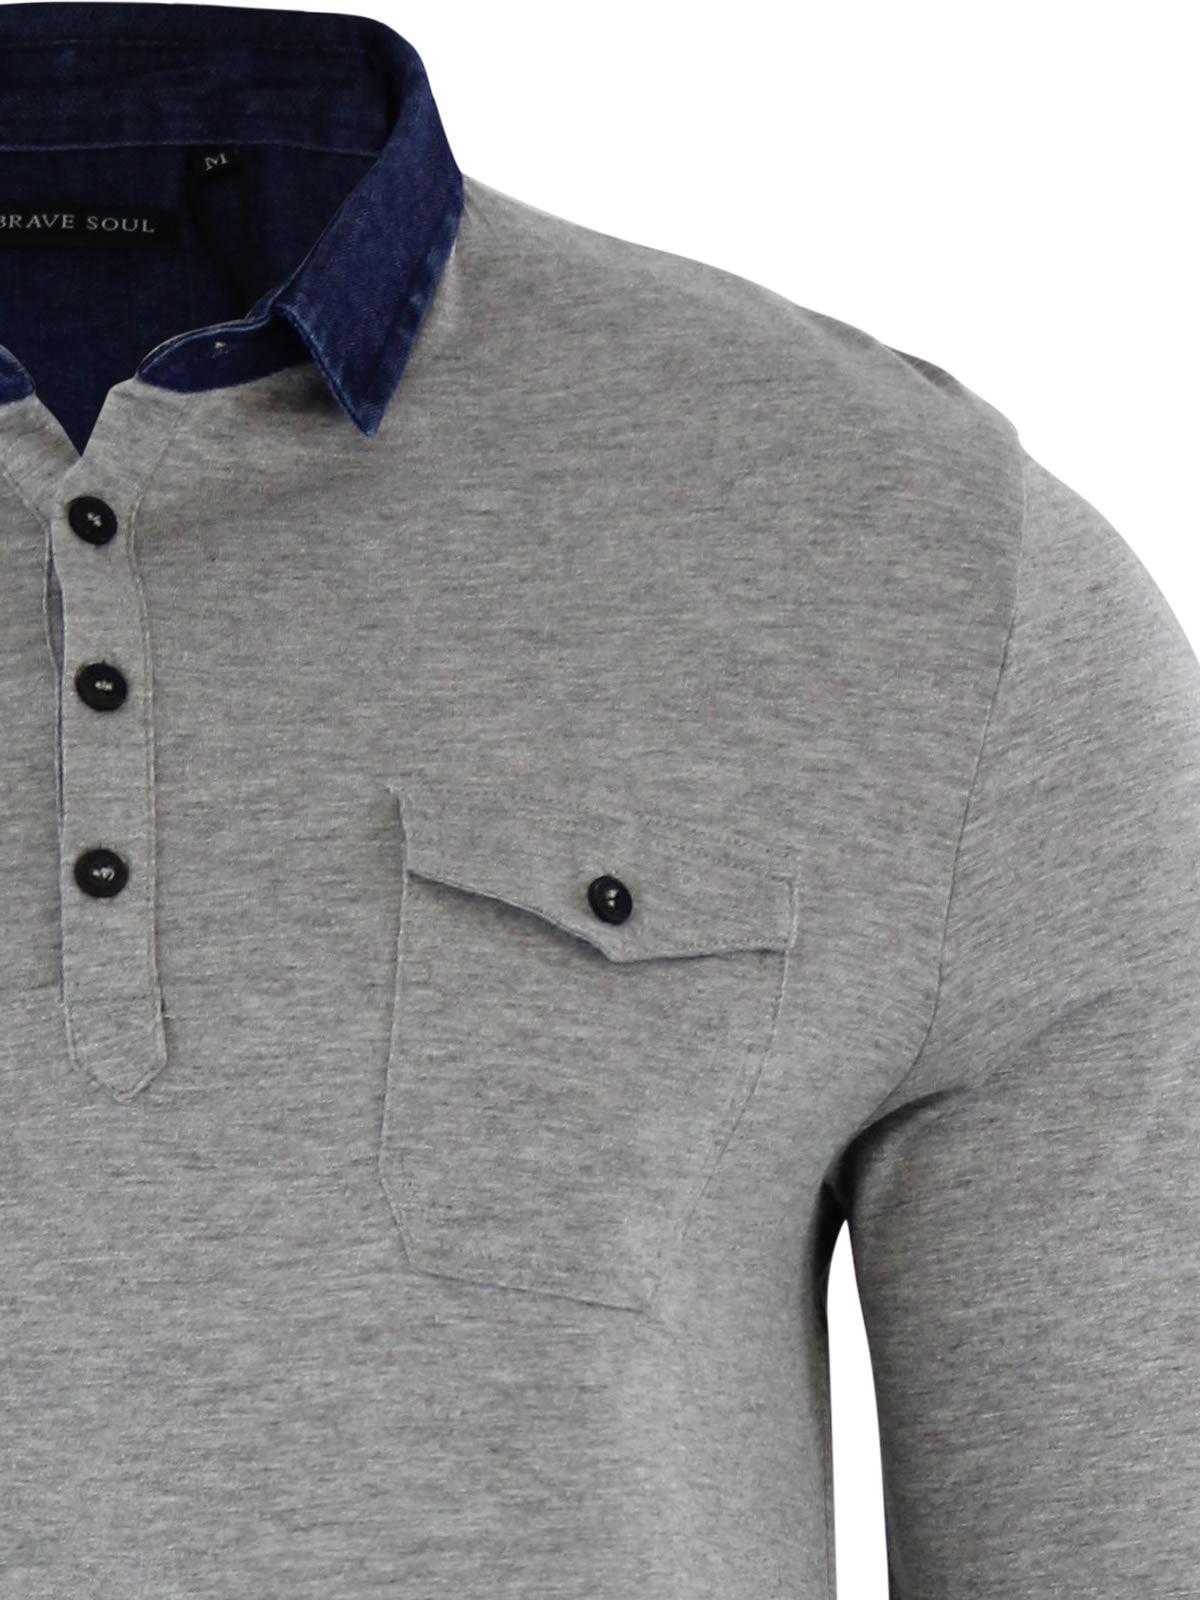 Brave-Soul-Gospel-Homme-Polo-T-Shirt-Denim-a-col-a-manches-longues-Top-Casual miniature 10